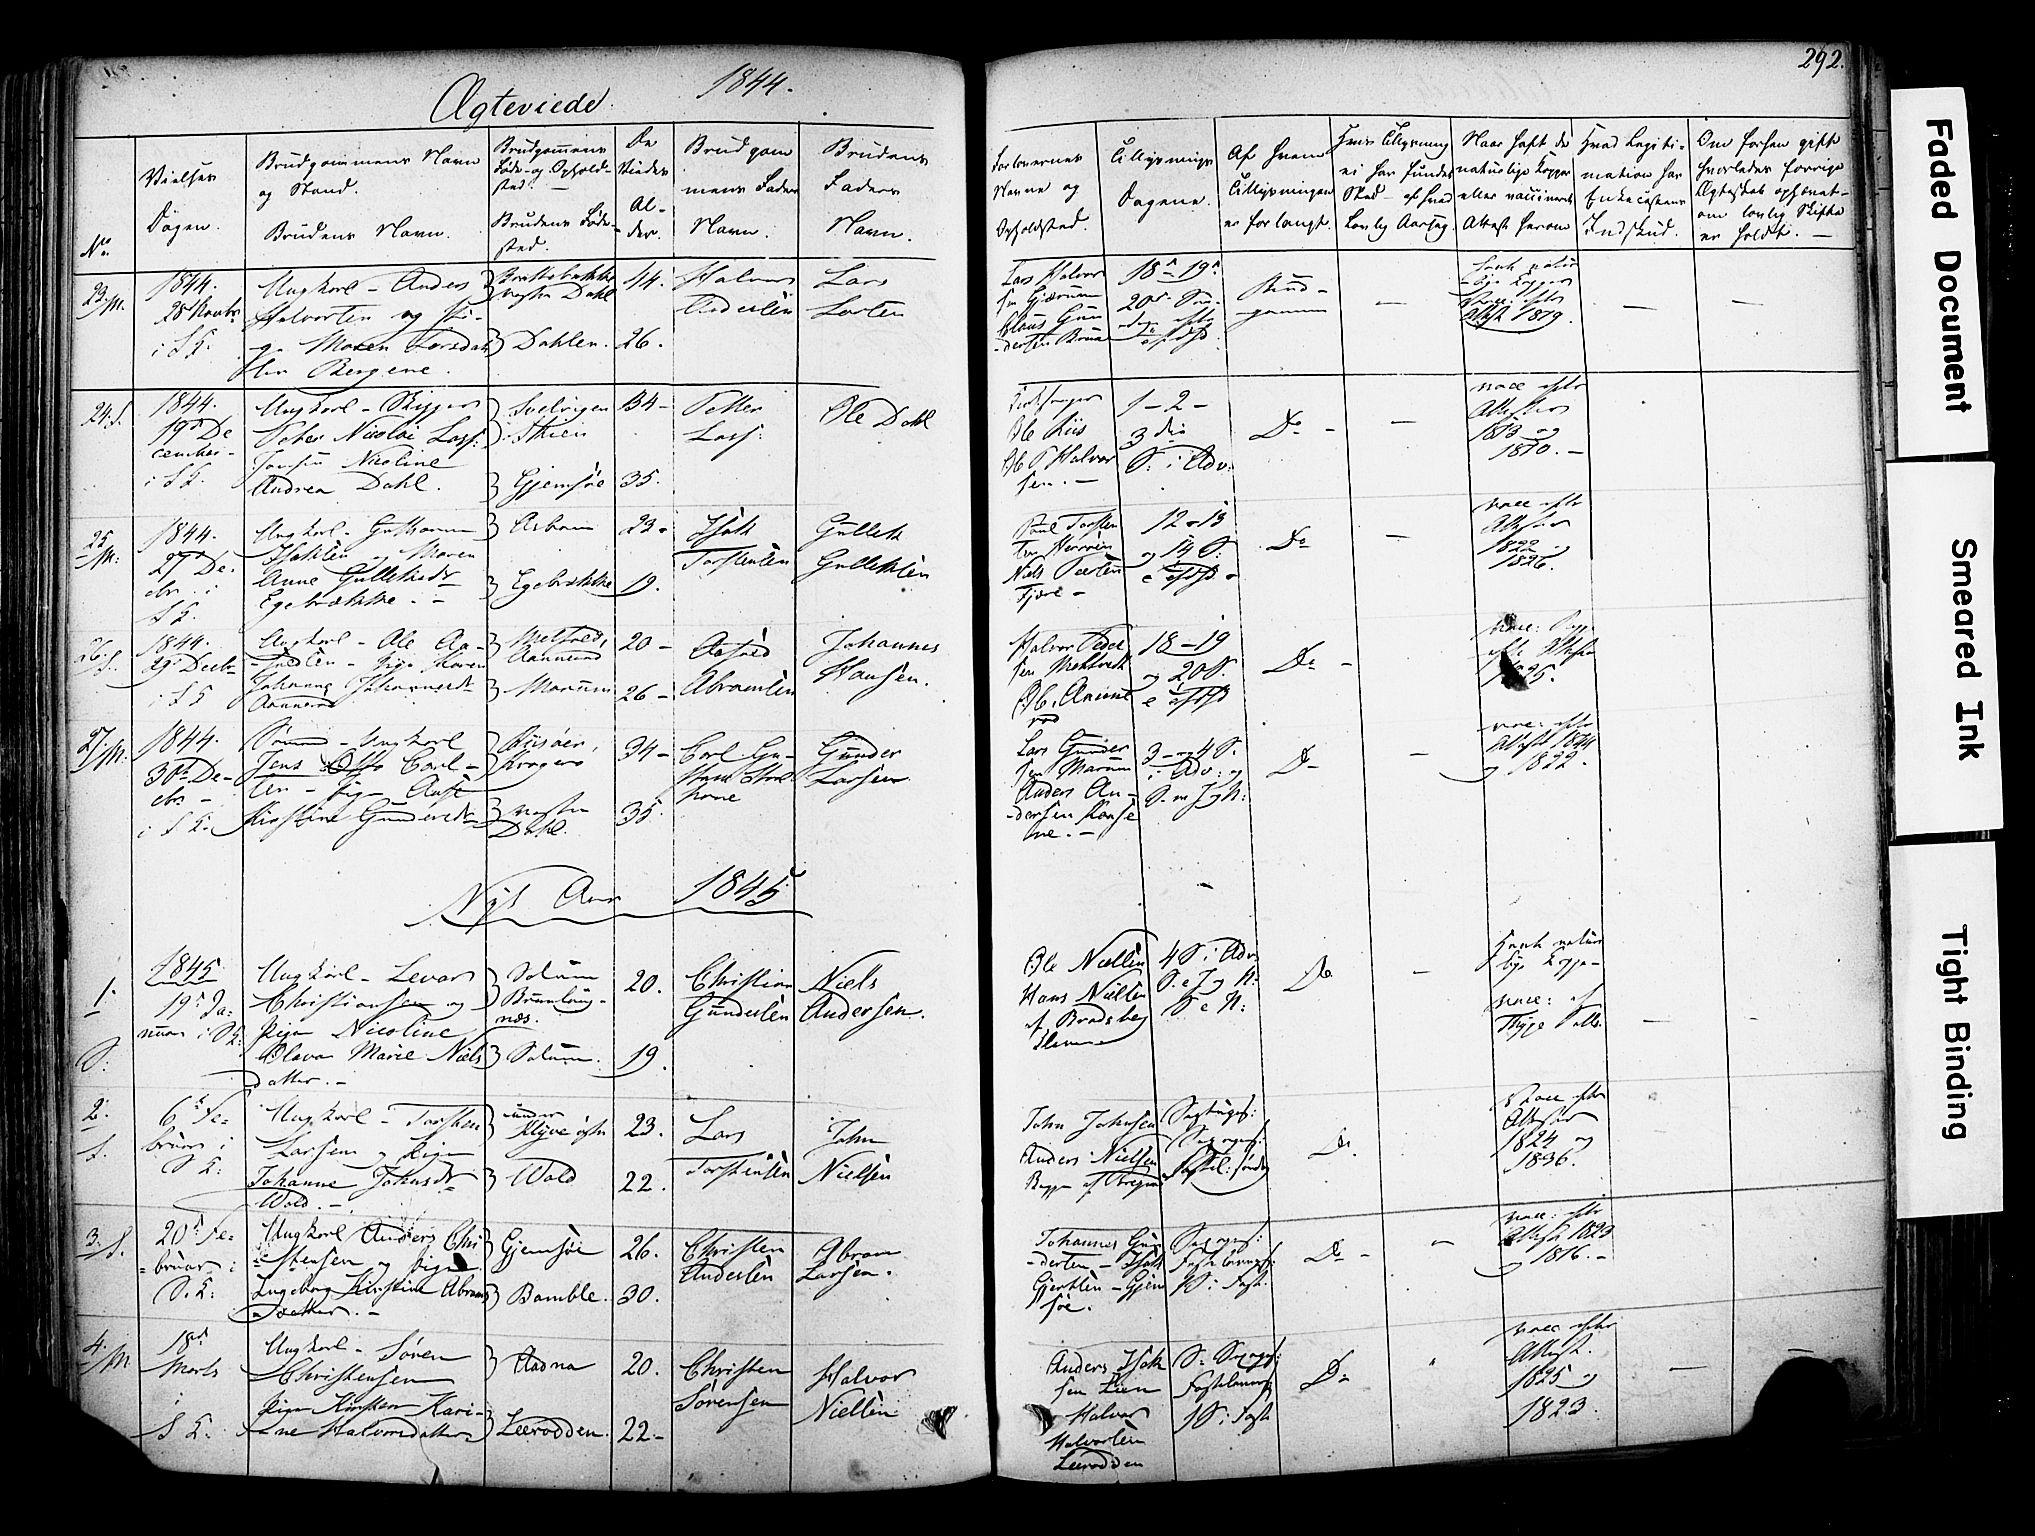 SAKO, Solum kirkebøker, F/Fa/L0006: Ministerialbok nr. I 6, 1844-1855, s. 292